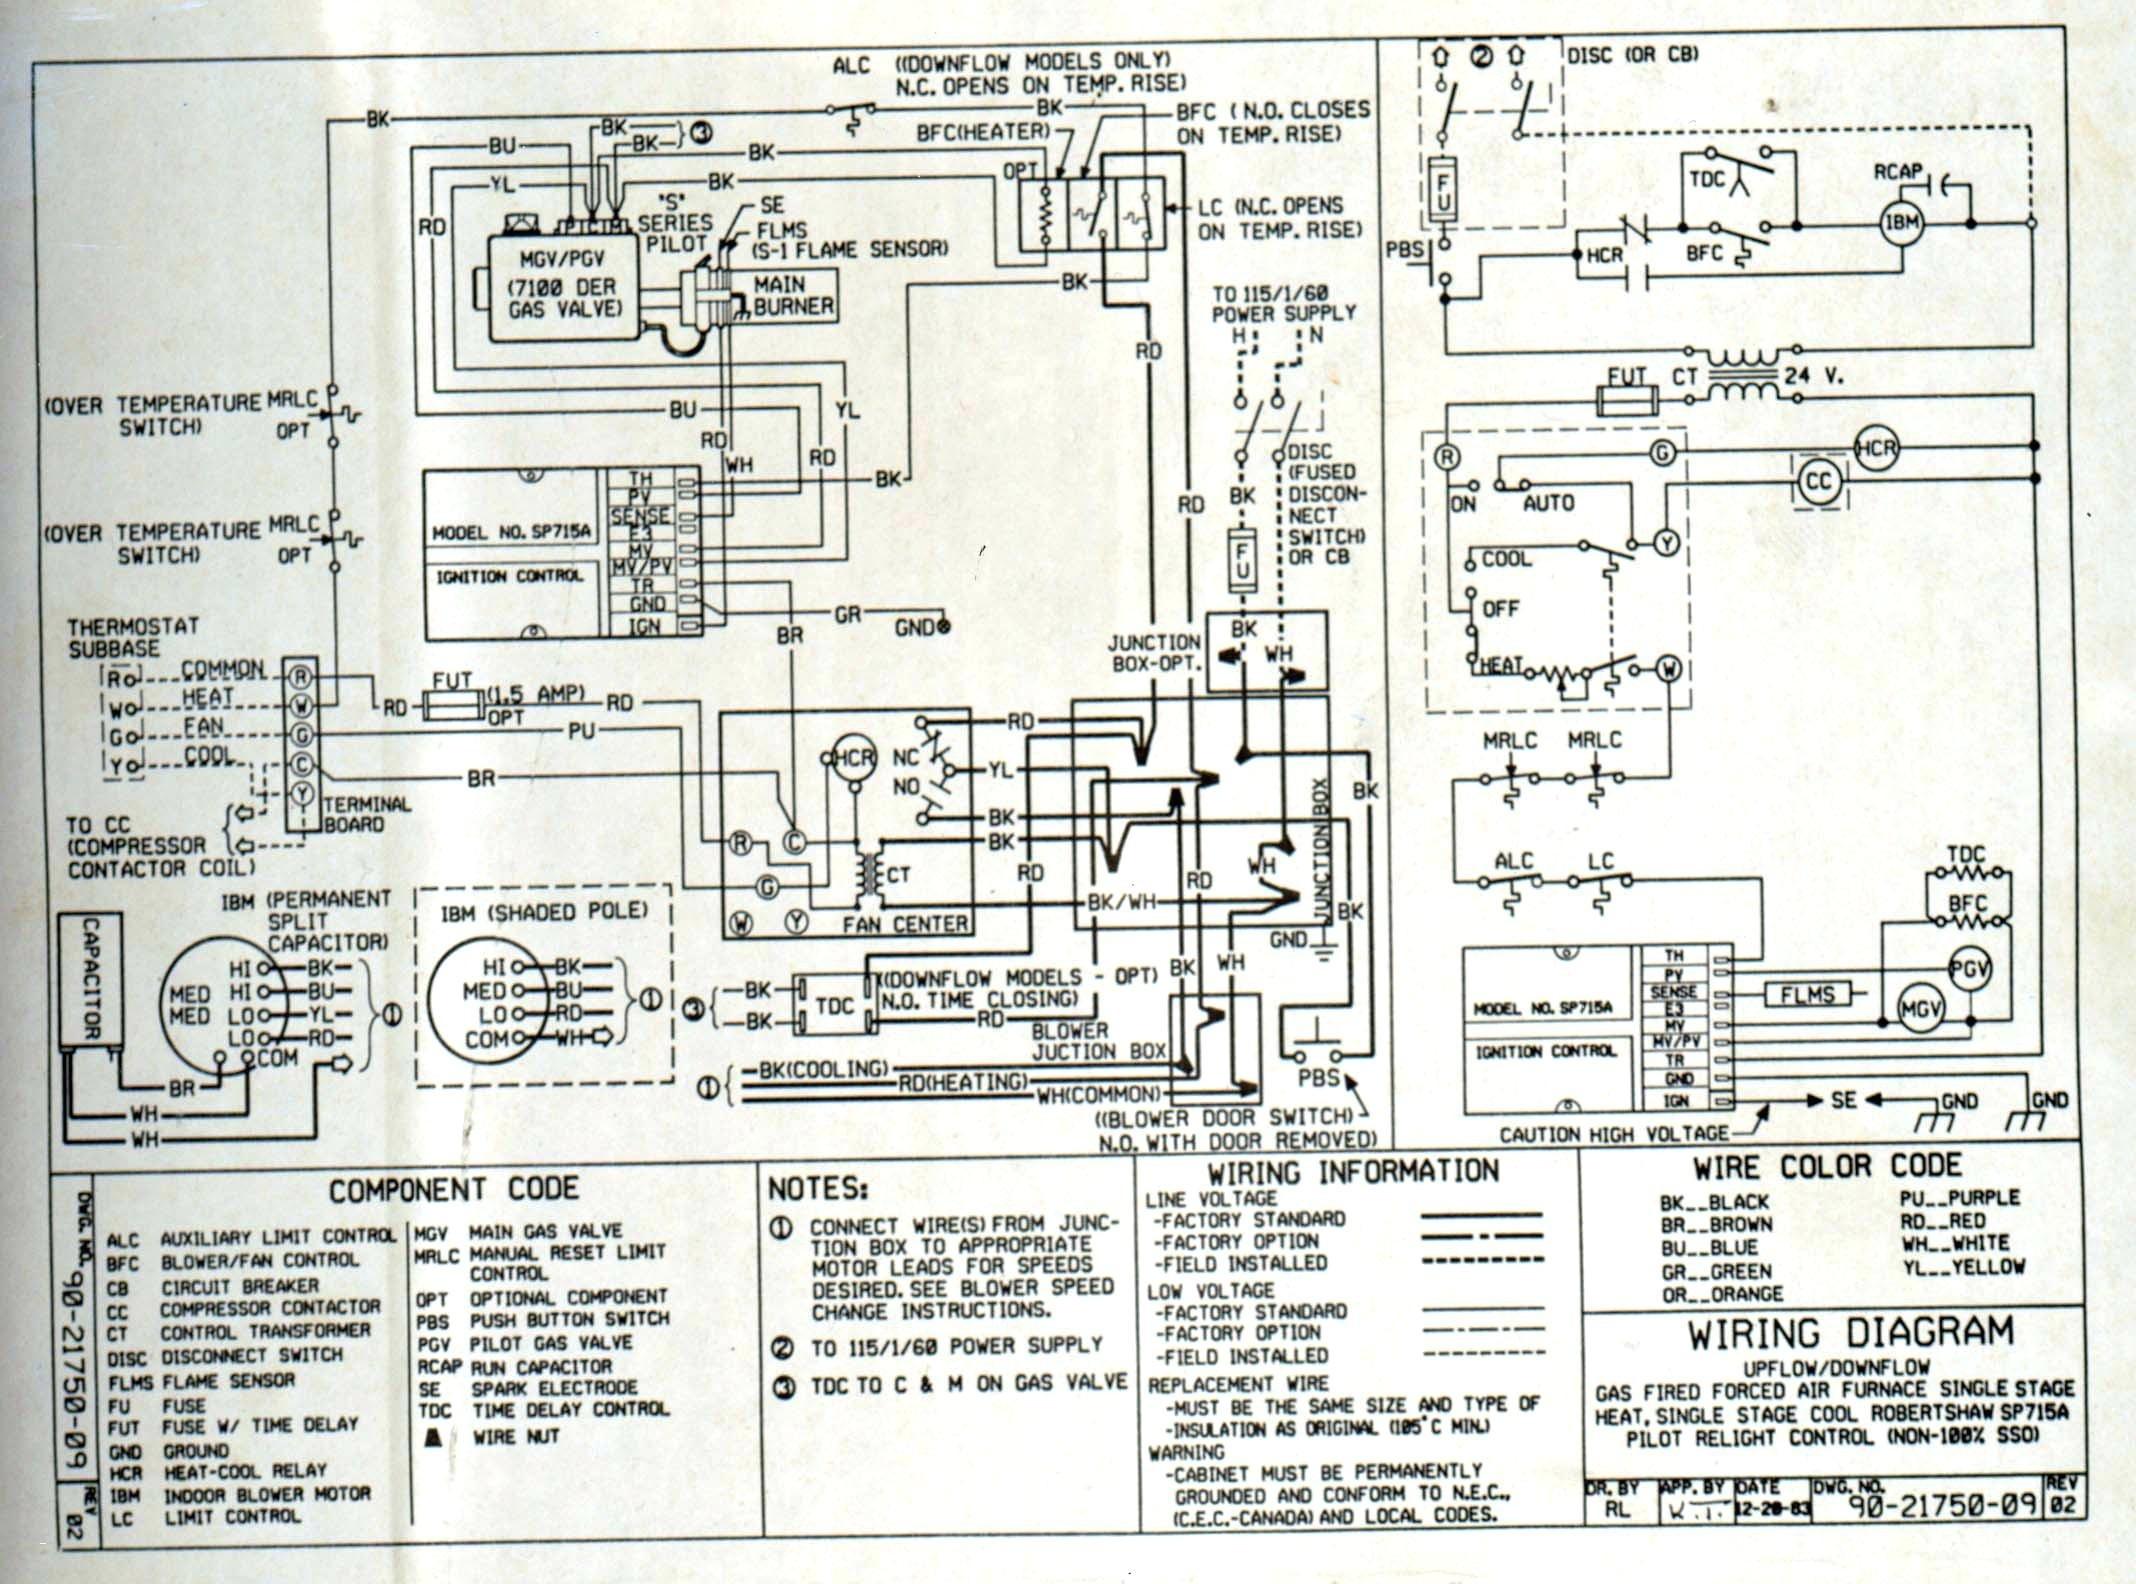 Wiring A Ac Thermostat Diagram New Goodman Air Handler Wiring Diagram Unique Wiring Diagram Goodman